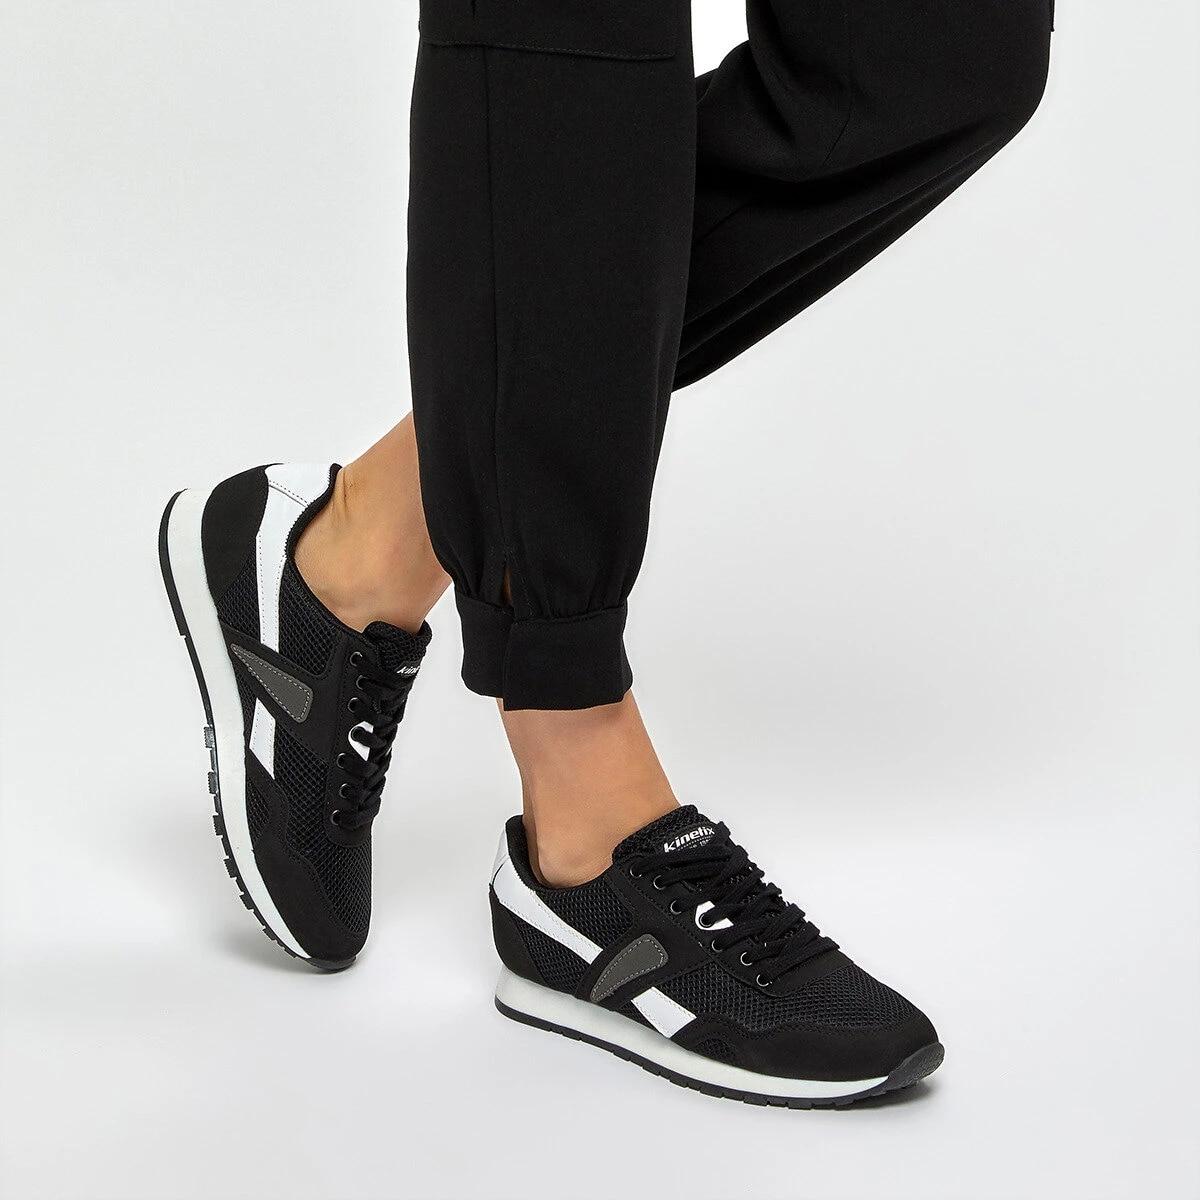 flo elsa black women s sports shoes kinetix